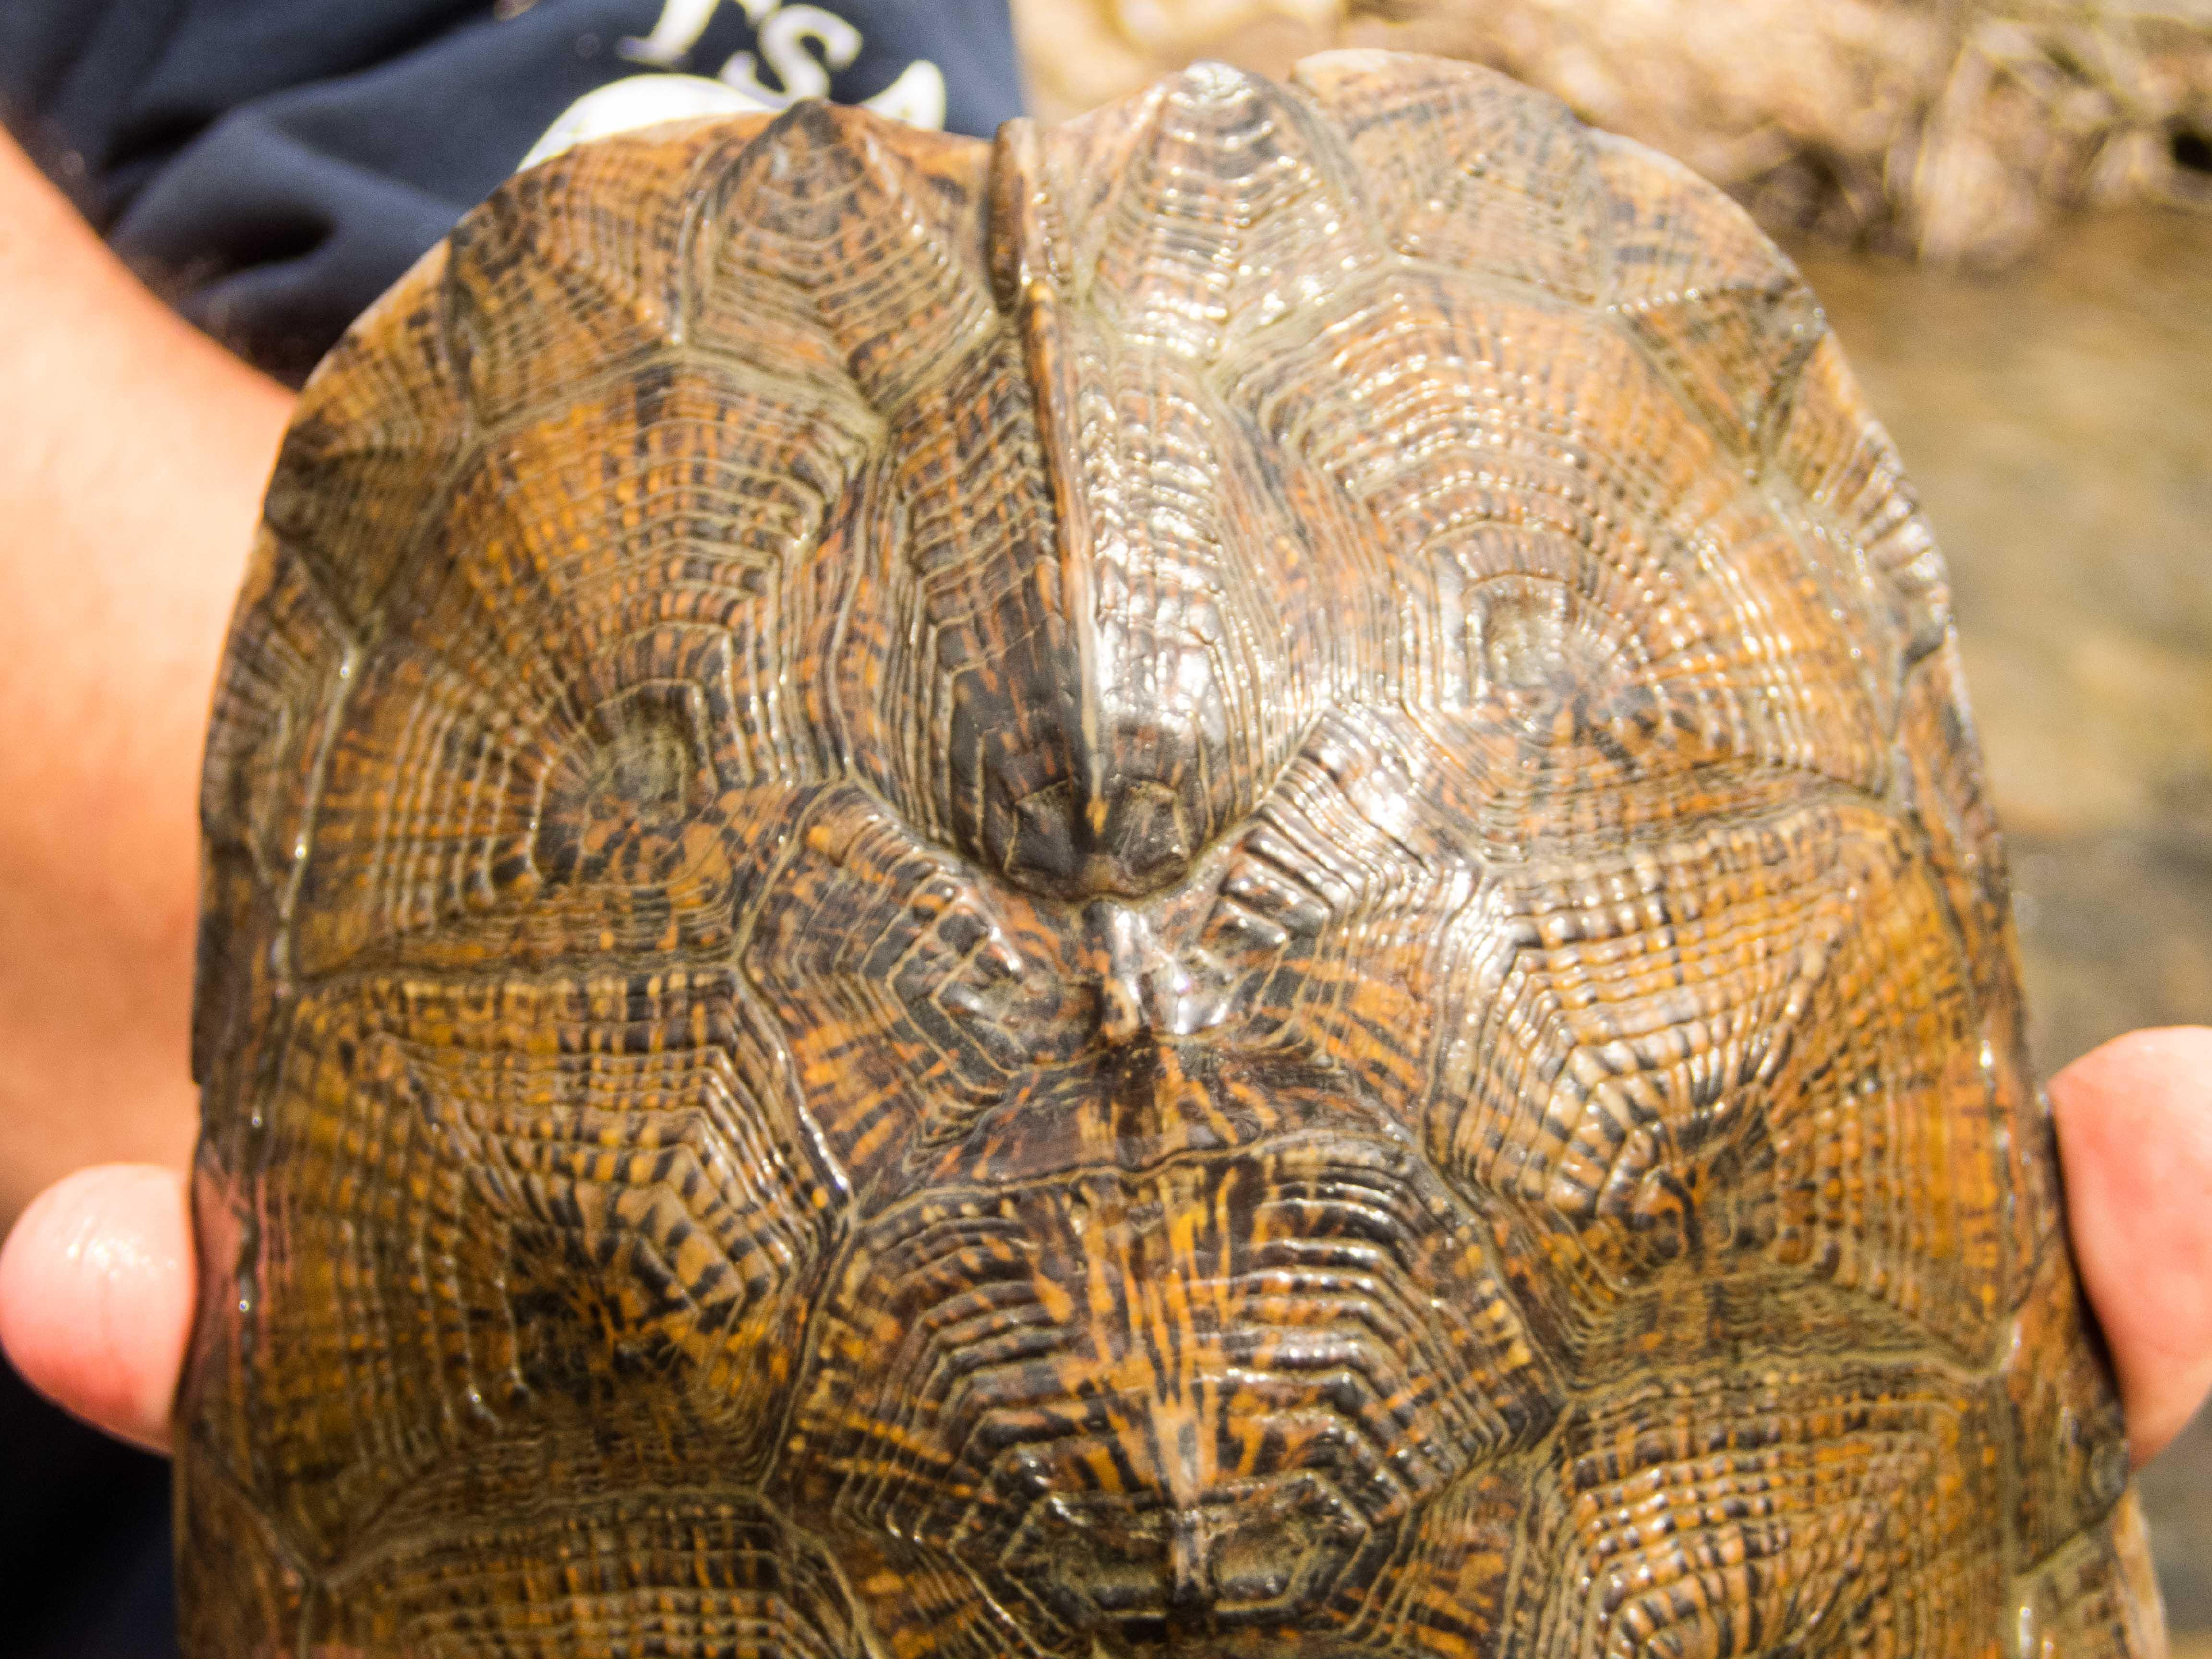 Adult Male Glyptemys insculpta (Wood Turtle), Lebanon County, PA